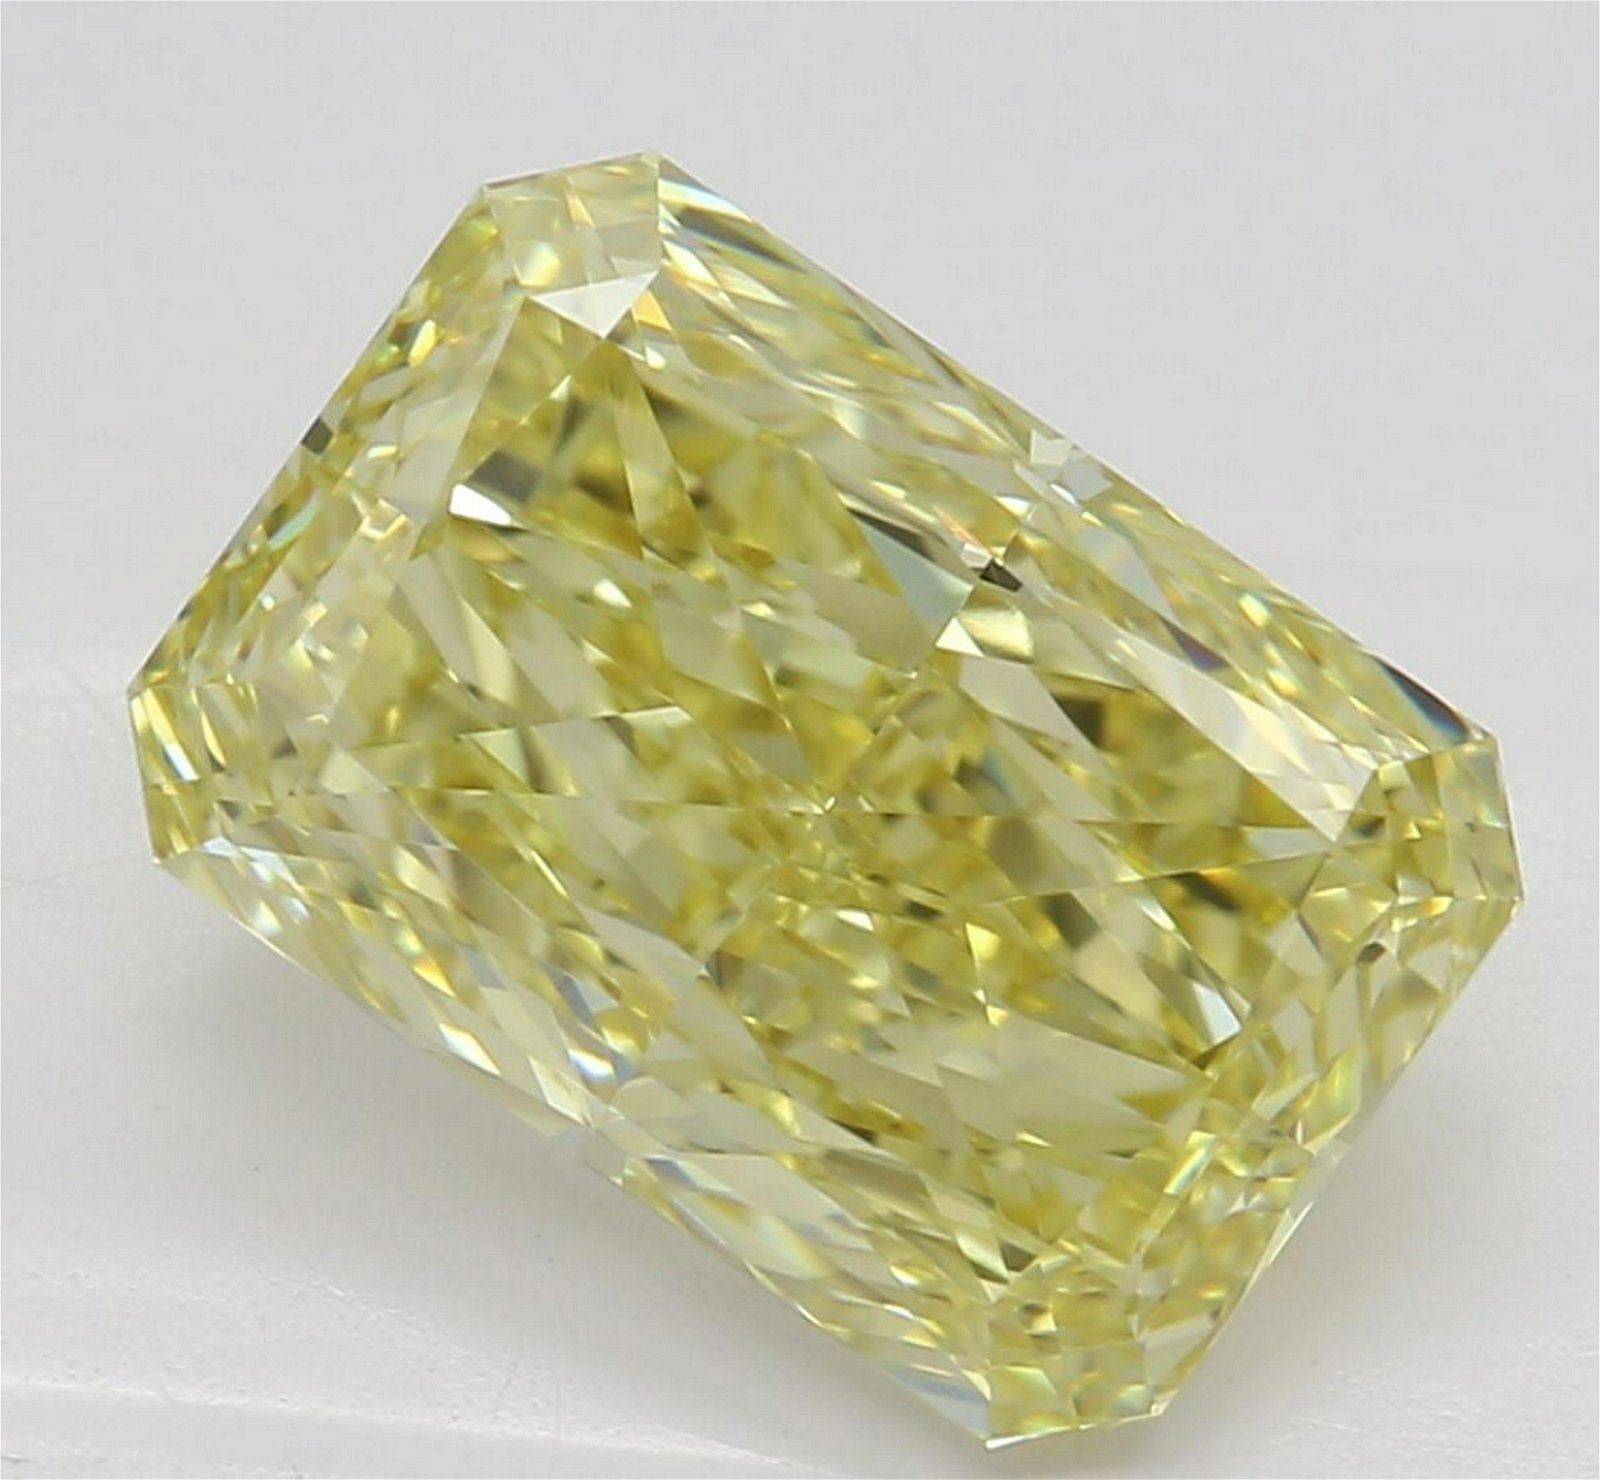 2.28 ct, Yellow/VVS2, Radiant cut Diamond